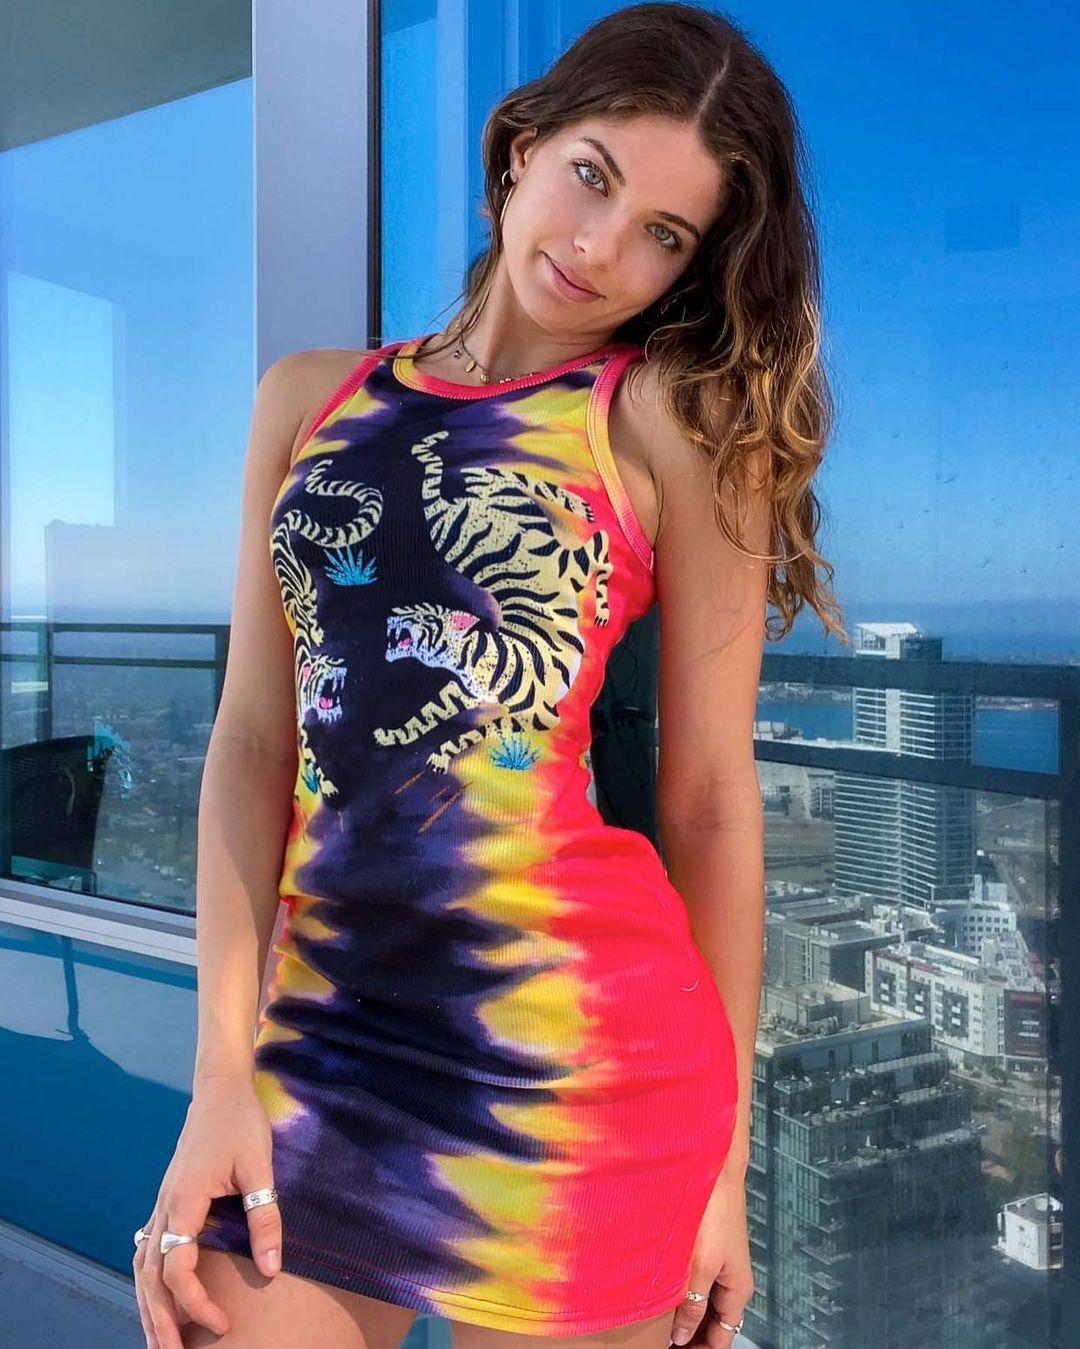 Victoria-Xavier-Wallpapers-Insta-Fit-Bio-8